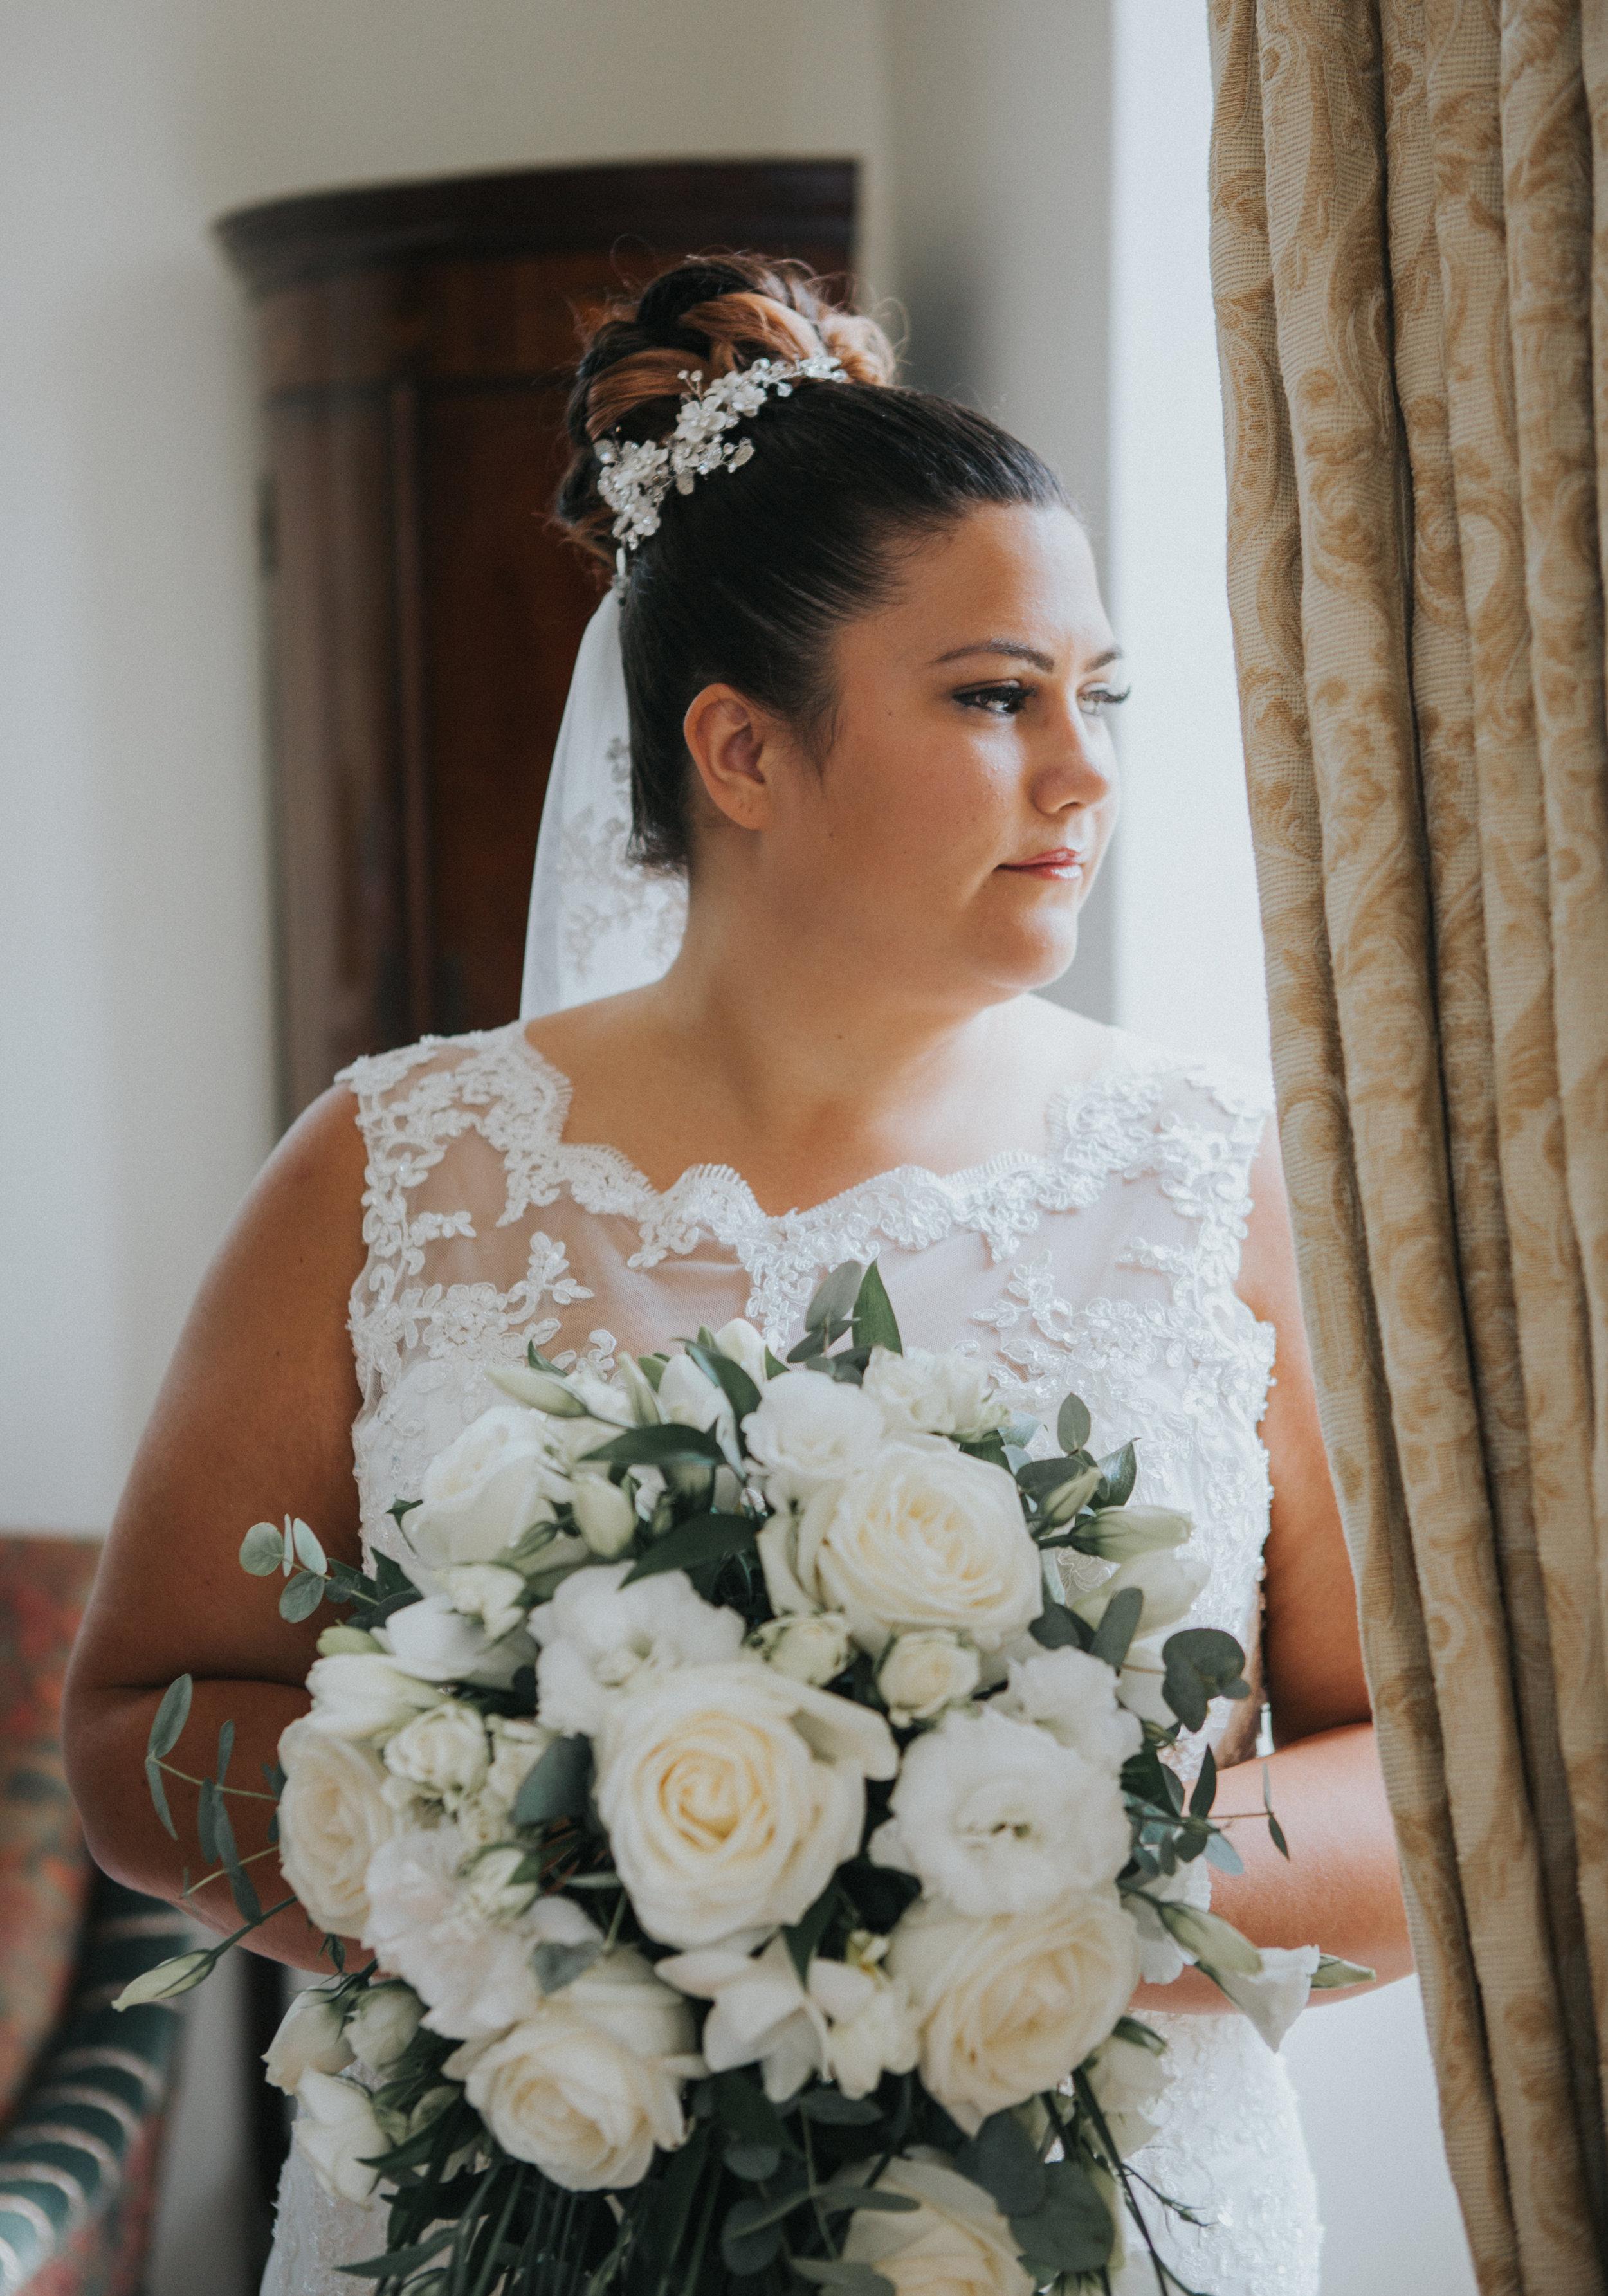 westenhangar-castle-kent-london-wedding-photography-bridal-portrait-32